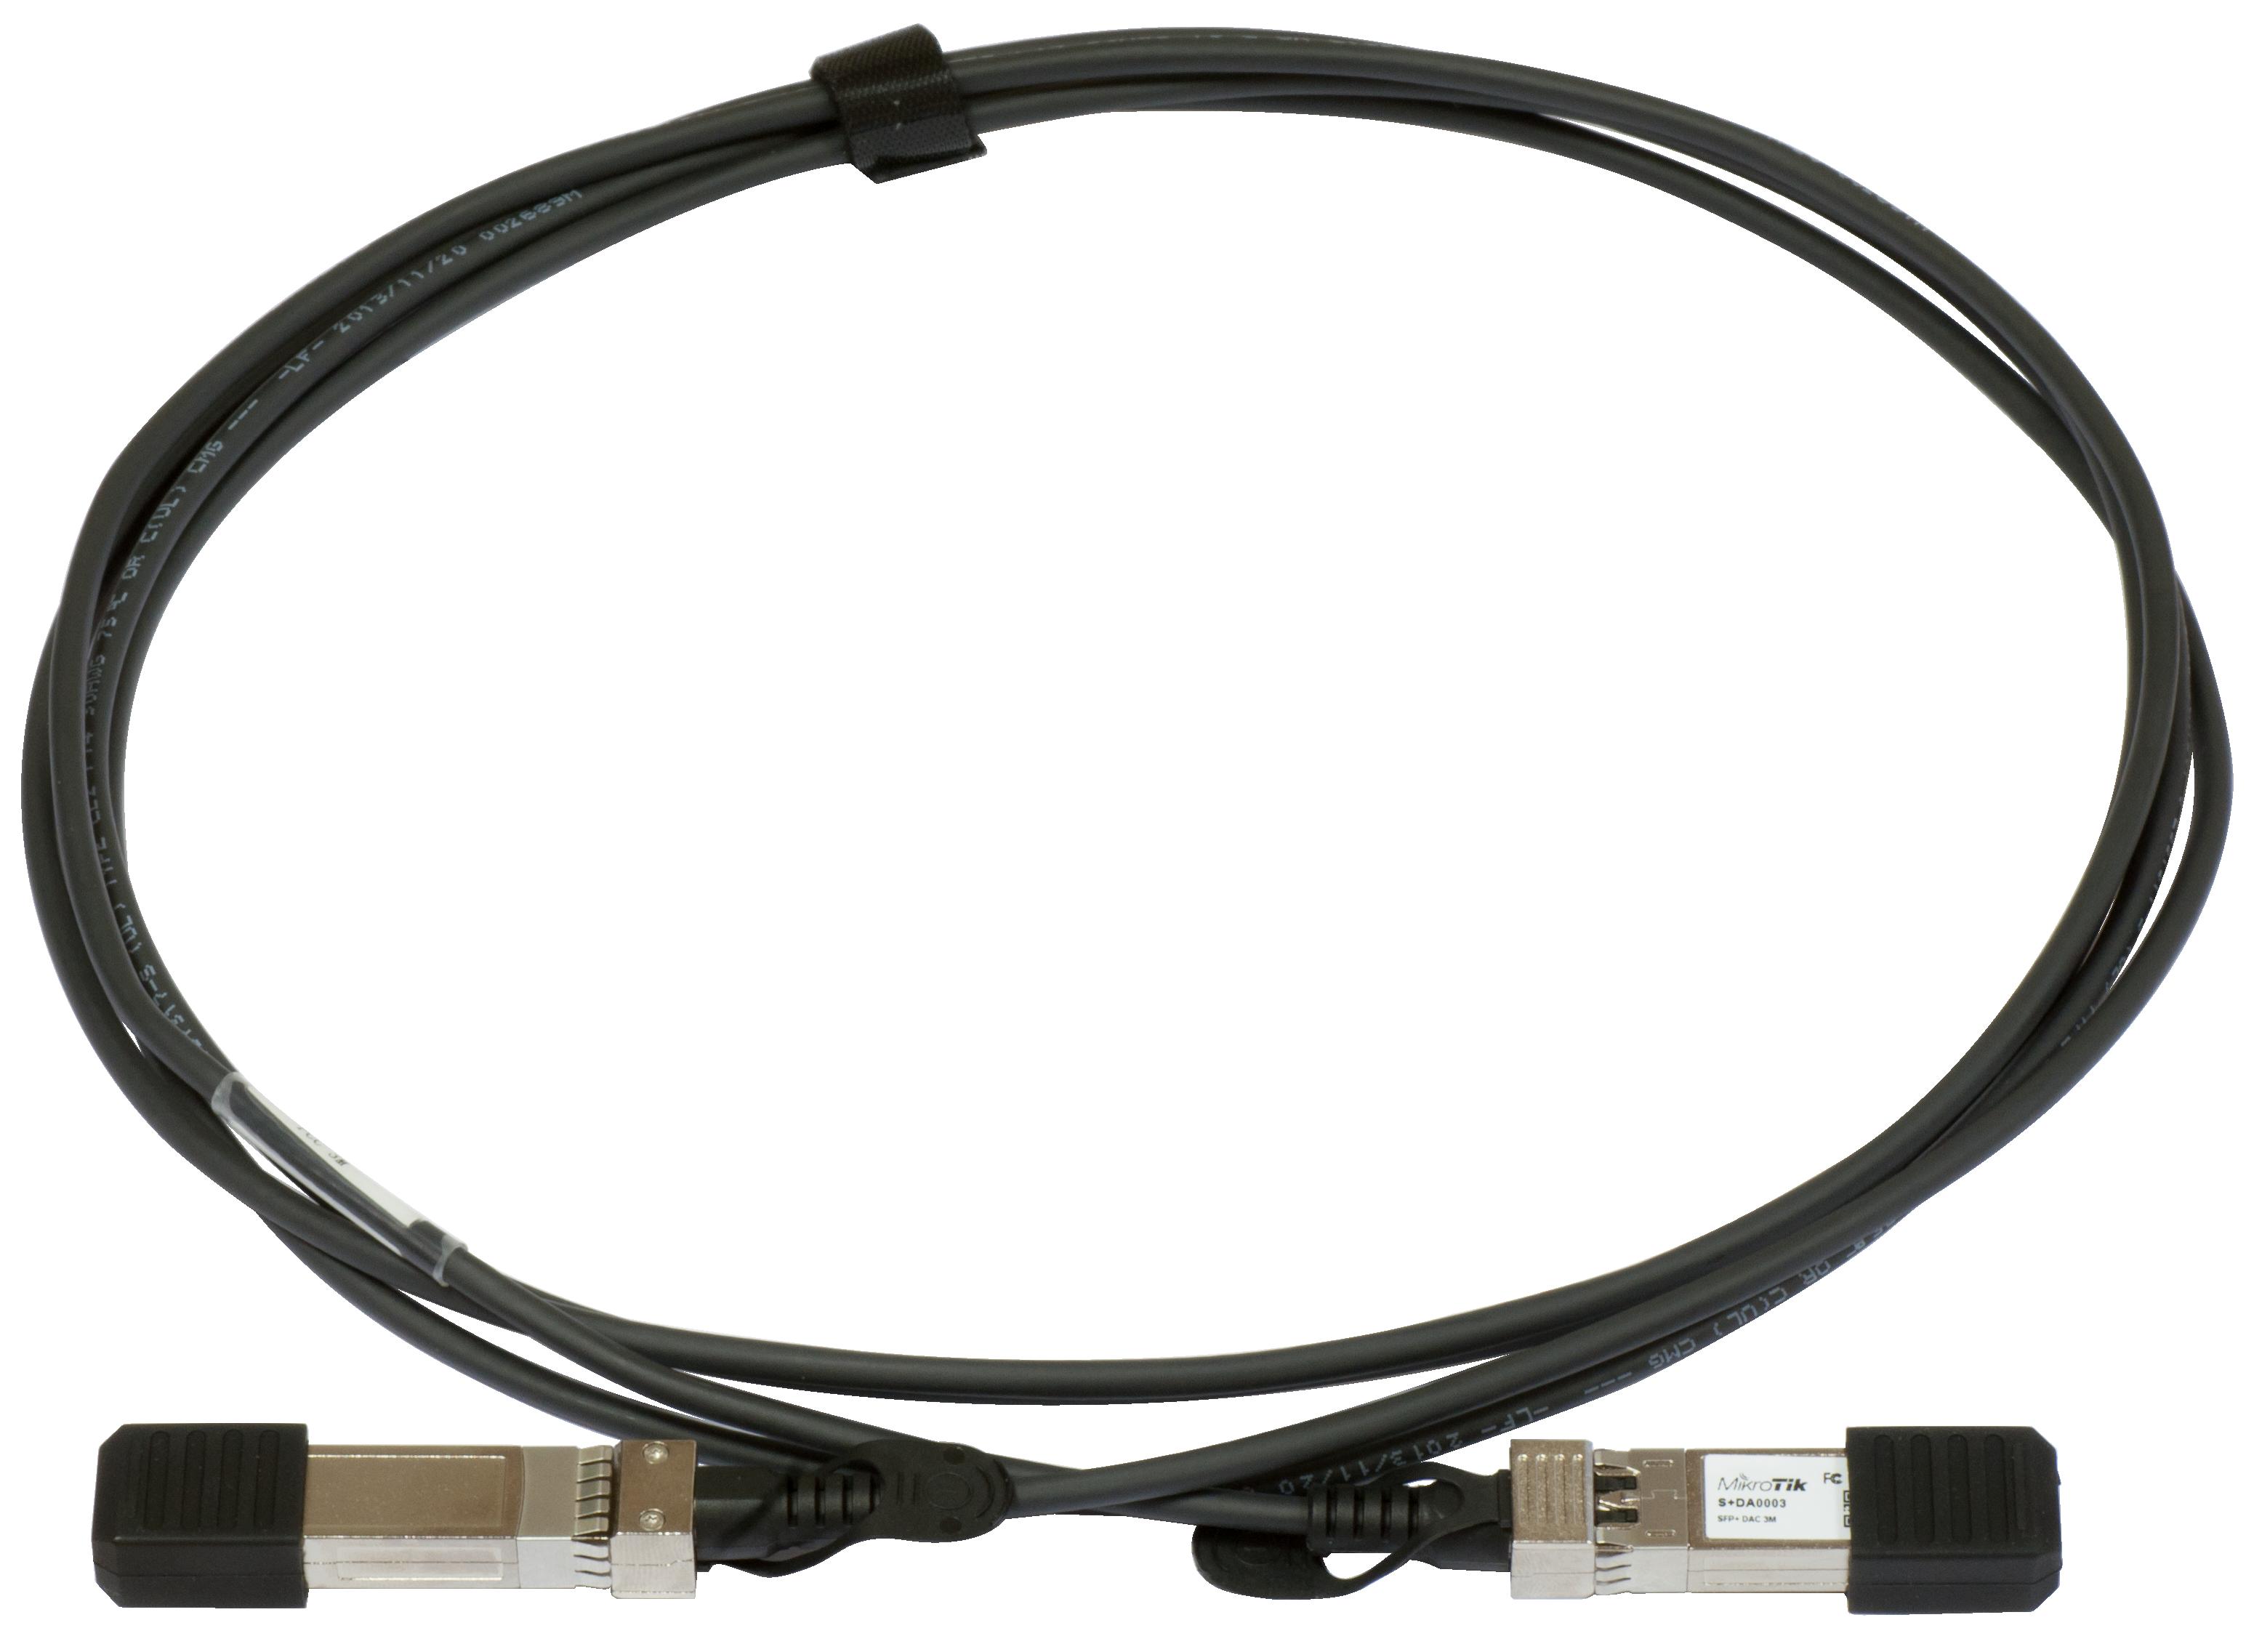 mikrotik sfp 3m direct attach cable. Black Bedroom Furniture Sets. Home Design Ideas